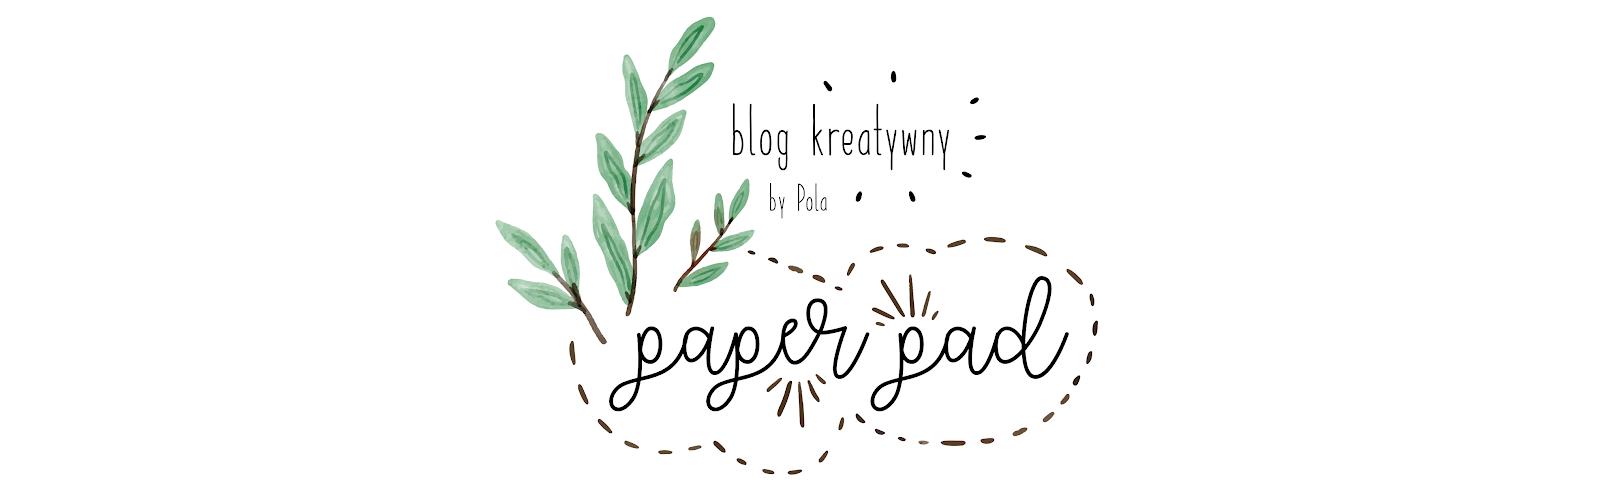 PaperPad | Blog Kreatywny